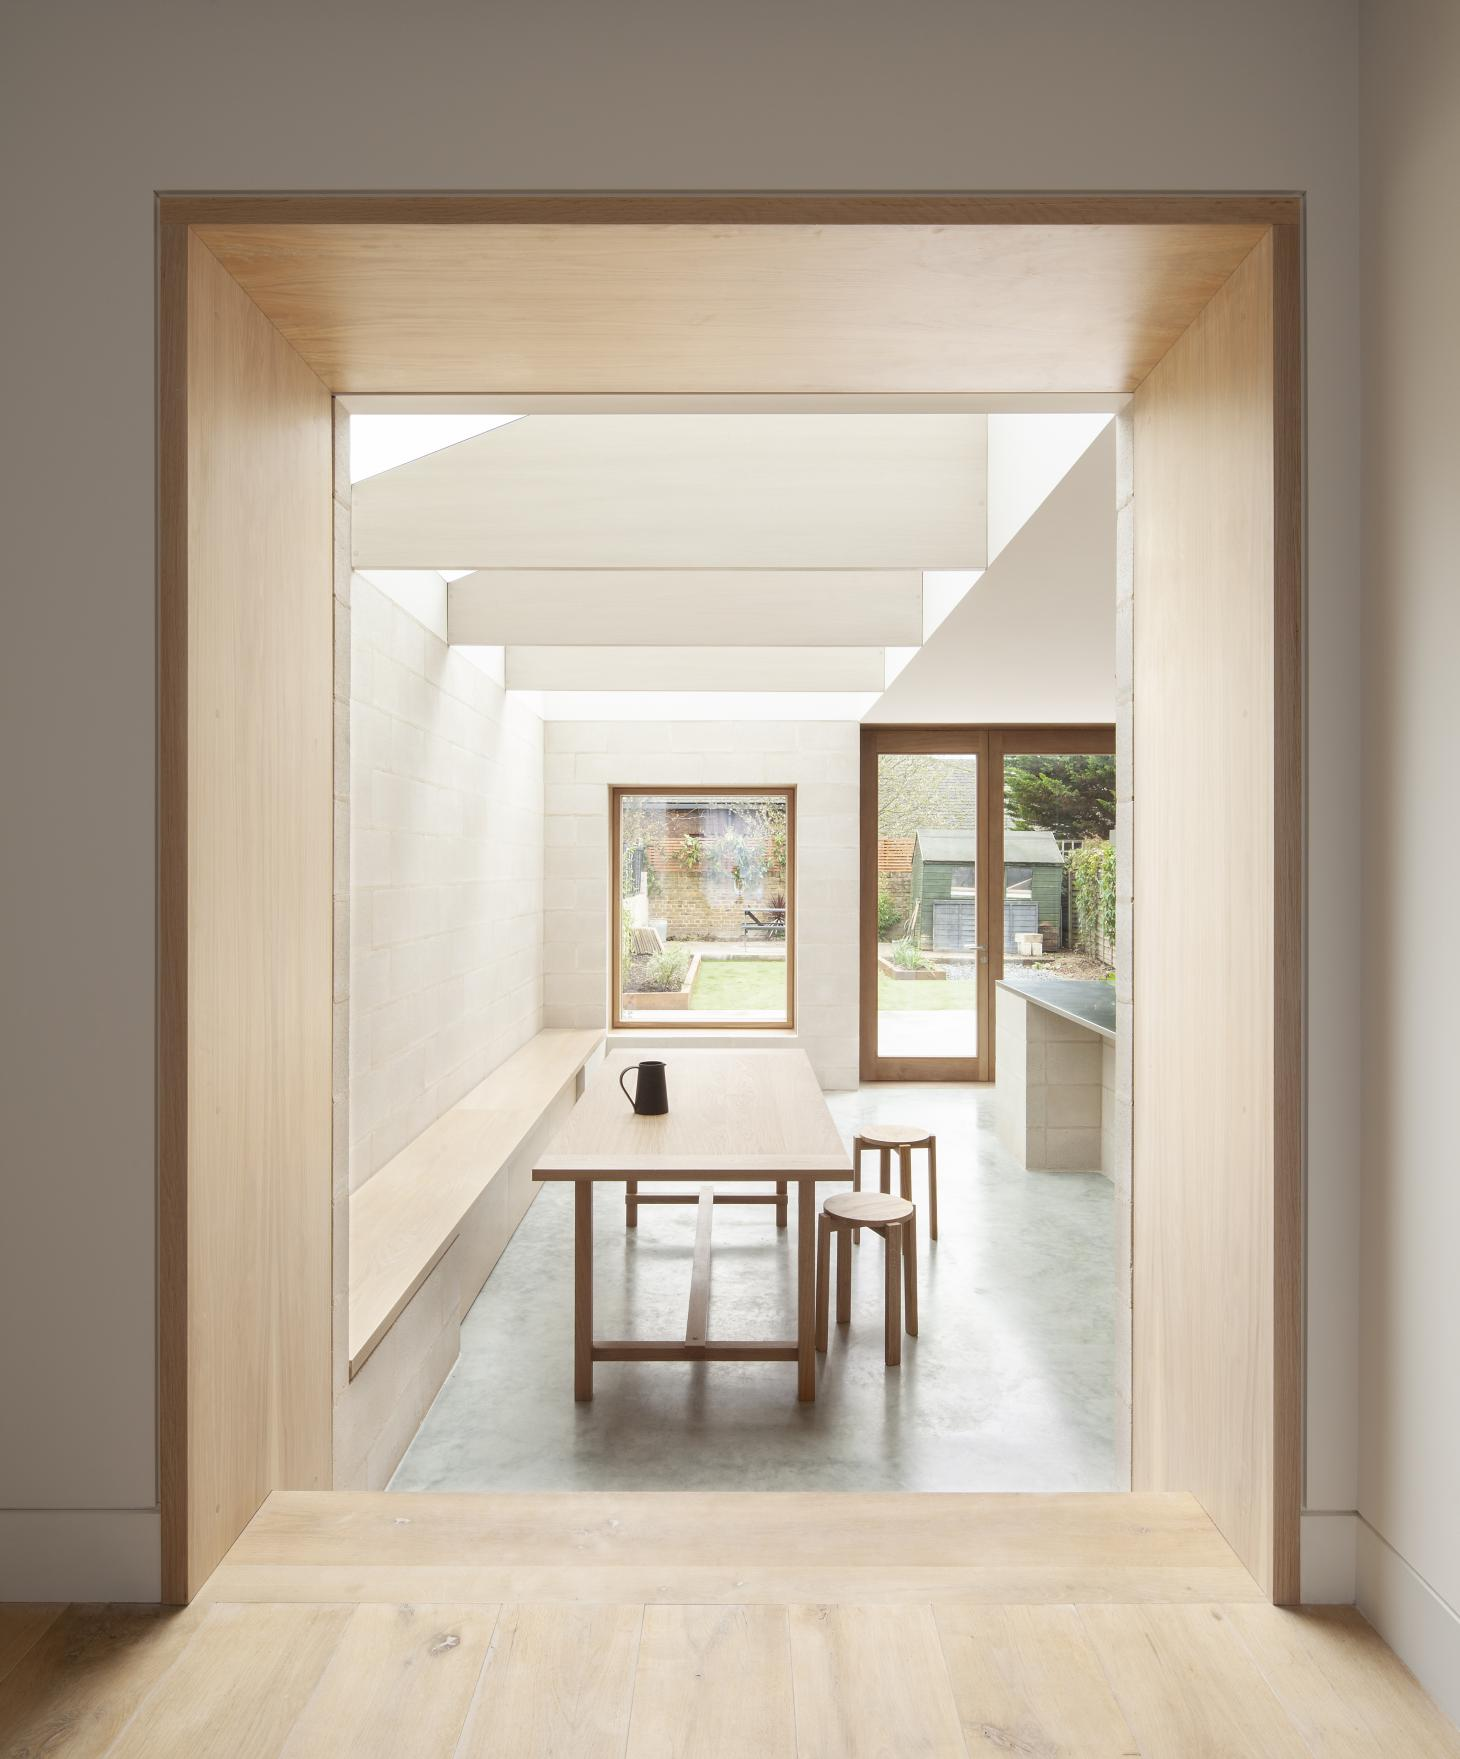 The minimalist house